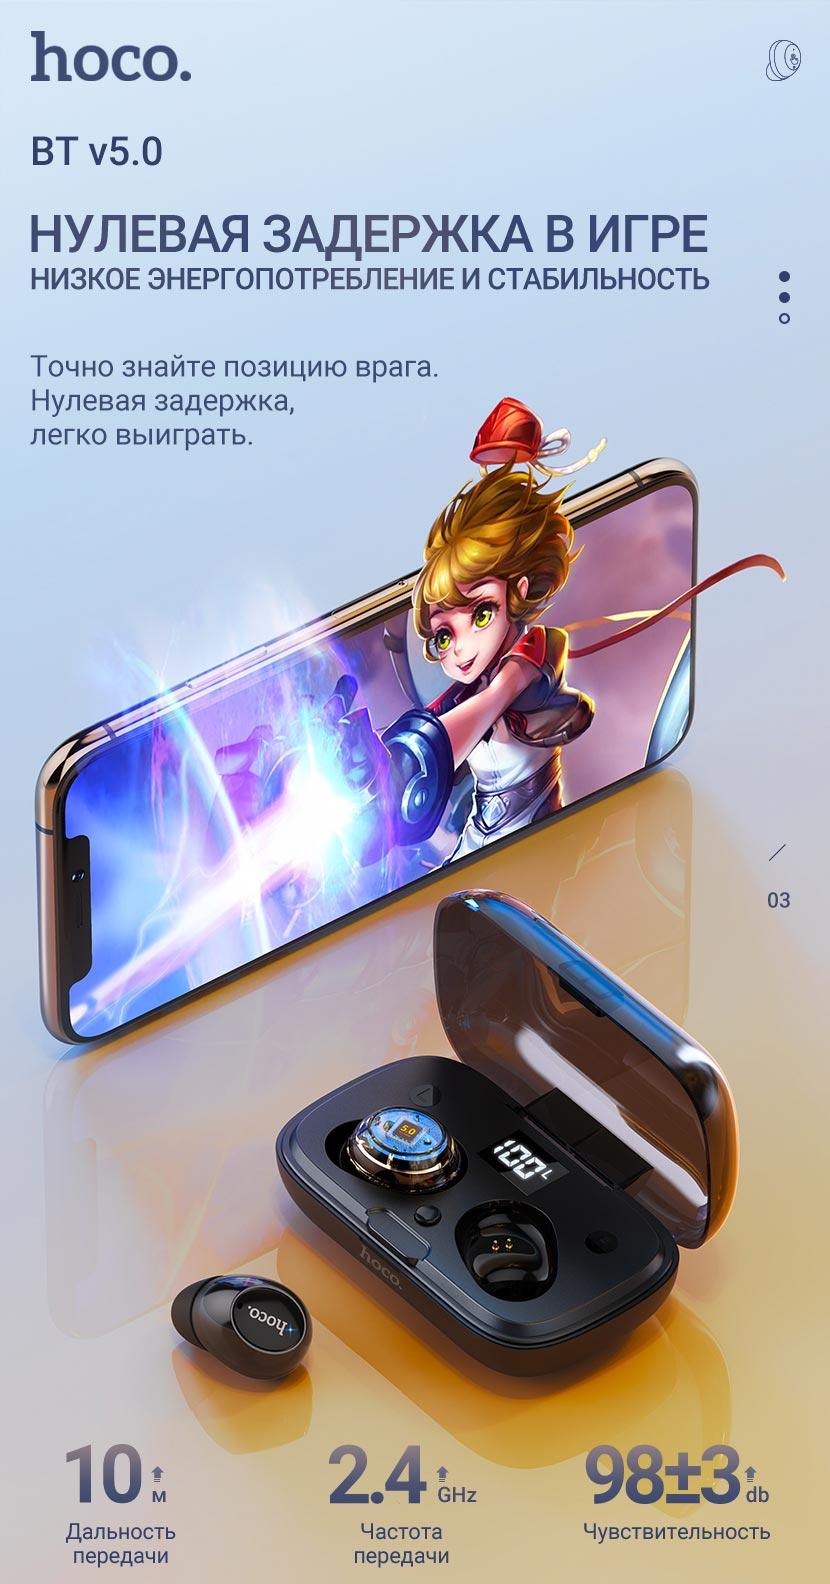 hoco news es52 delight tws wireless bt headset zero delay ru